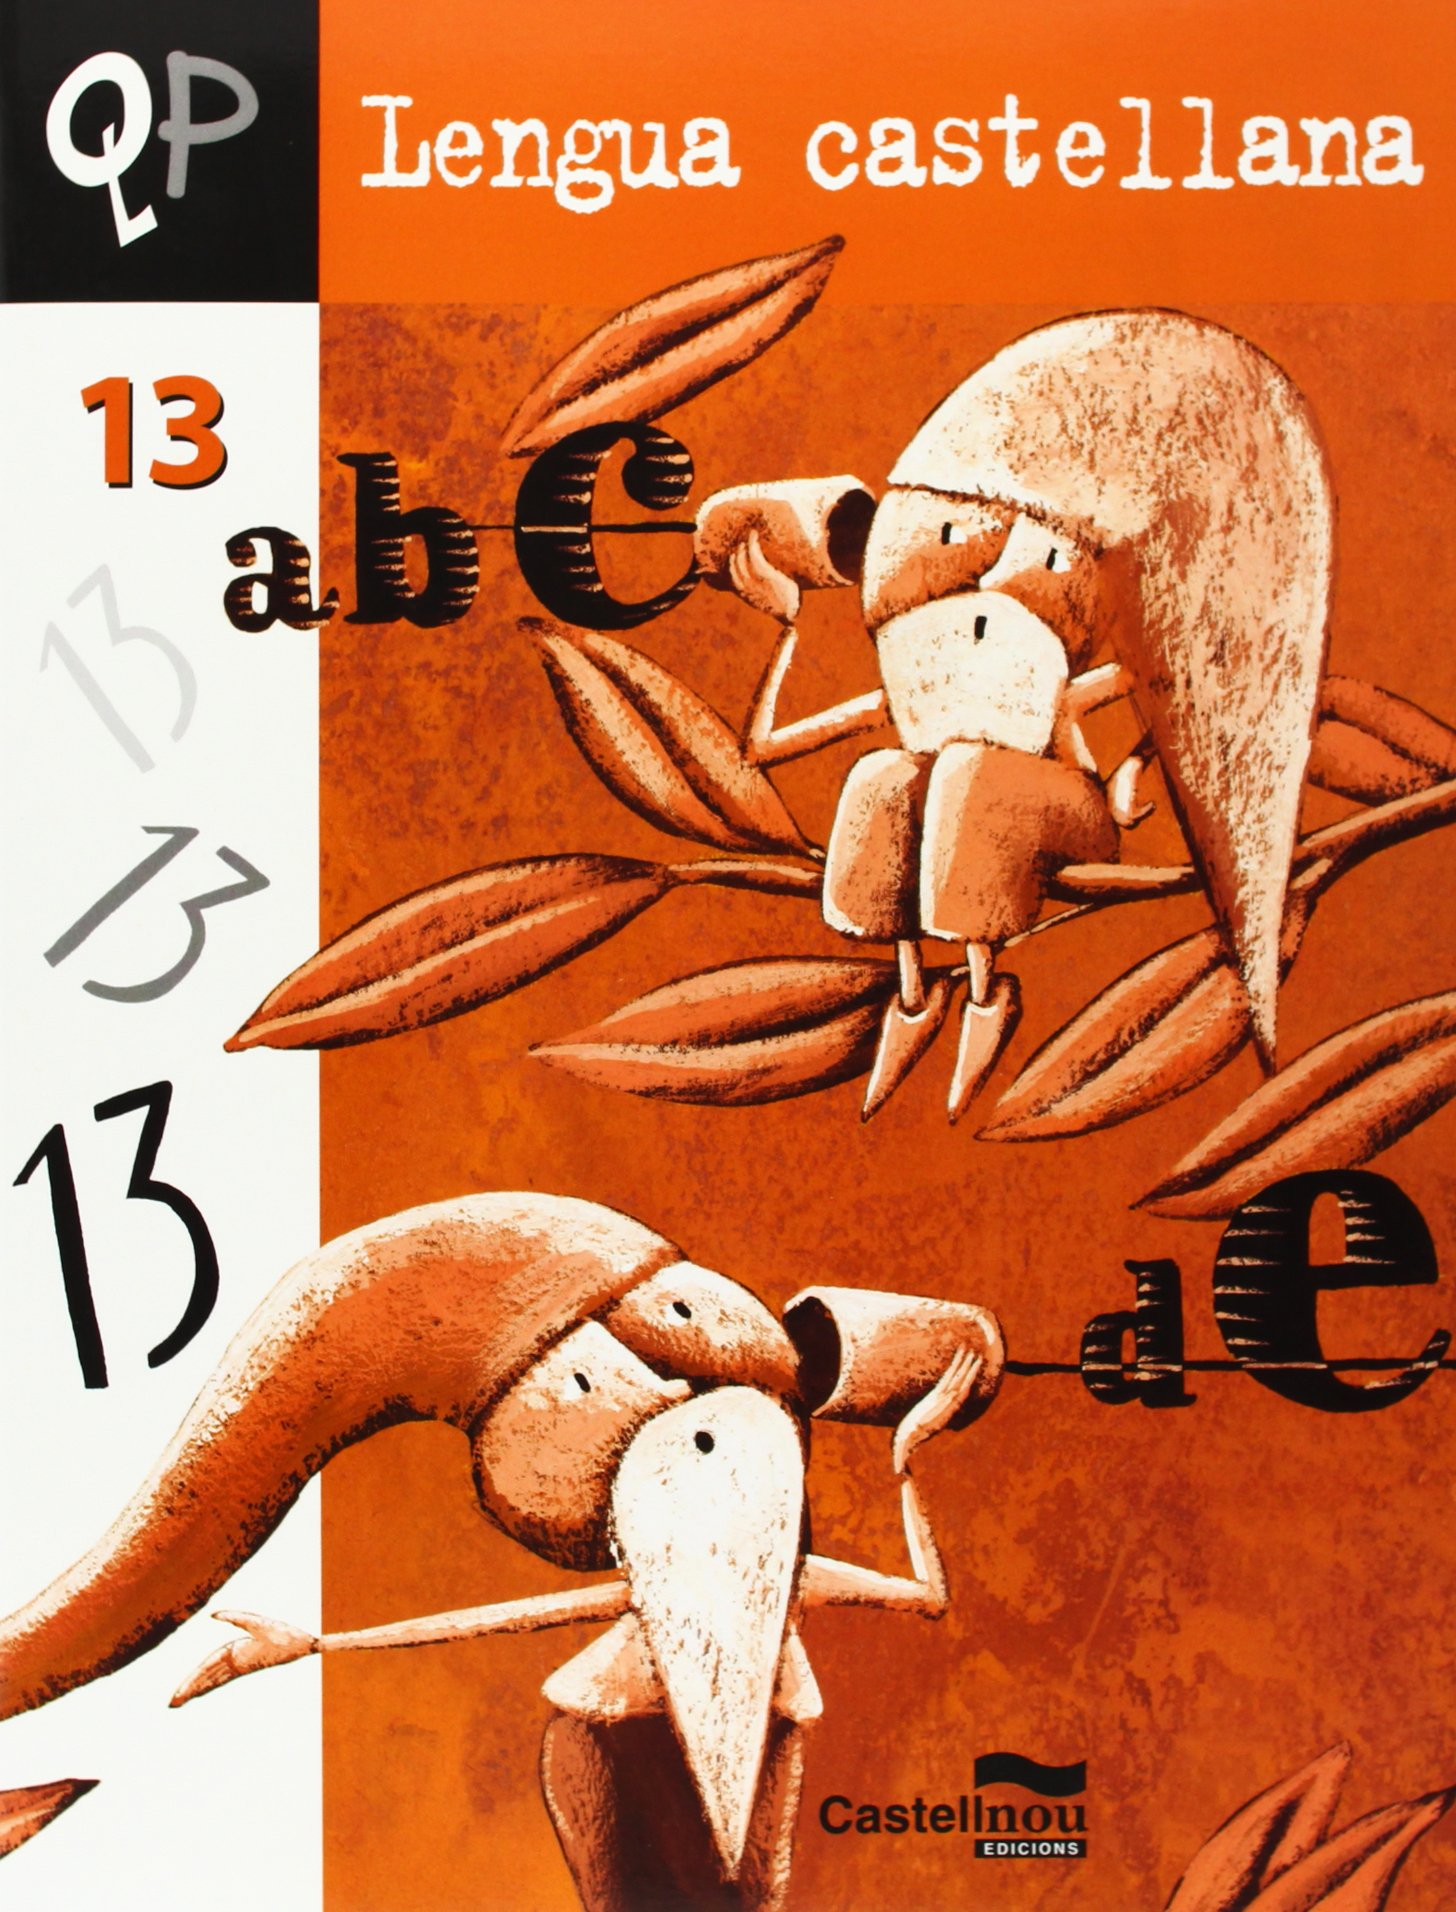 QP Lengua castellana 13 (Spanish) Paperback – February 1, 2005